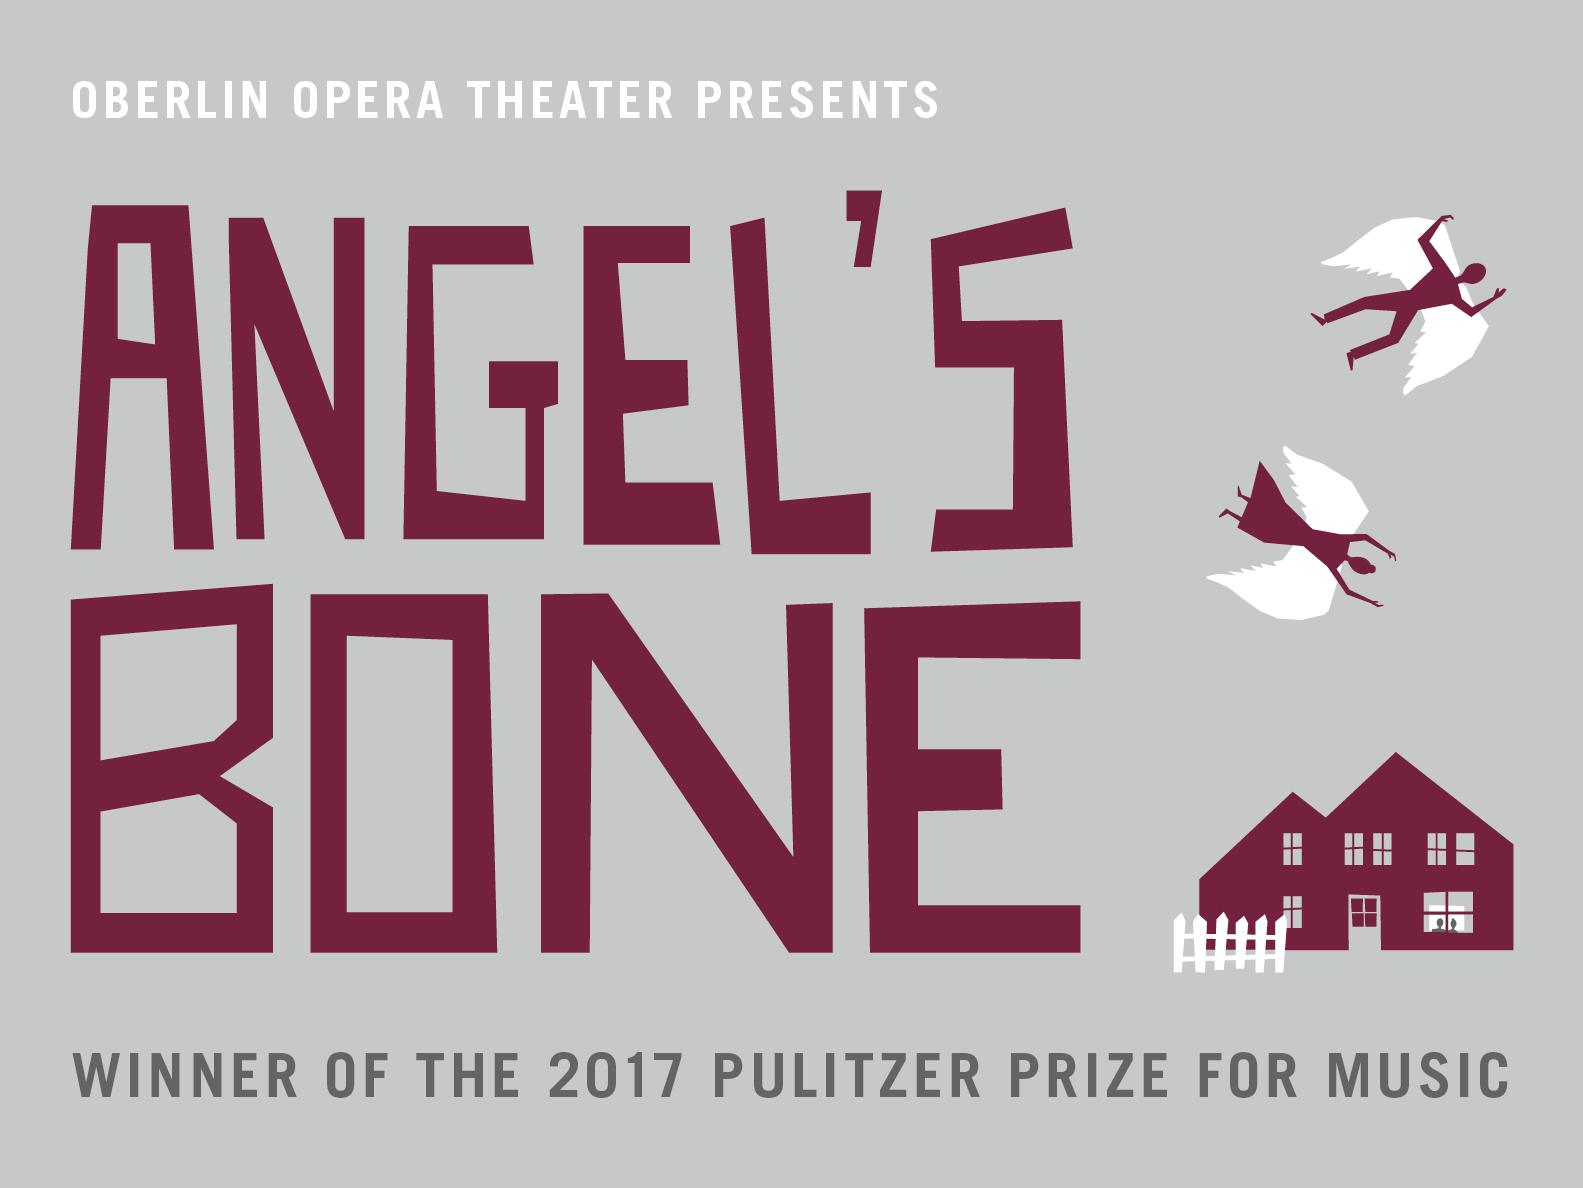 Pulitzer Prize Winning Opera Angel's Bone Gets Exclusive